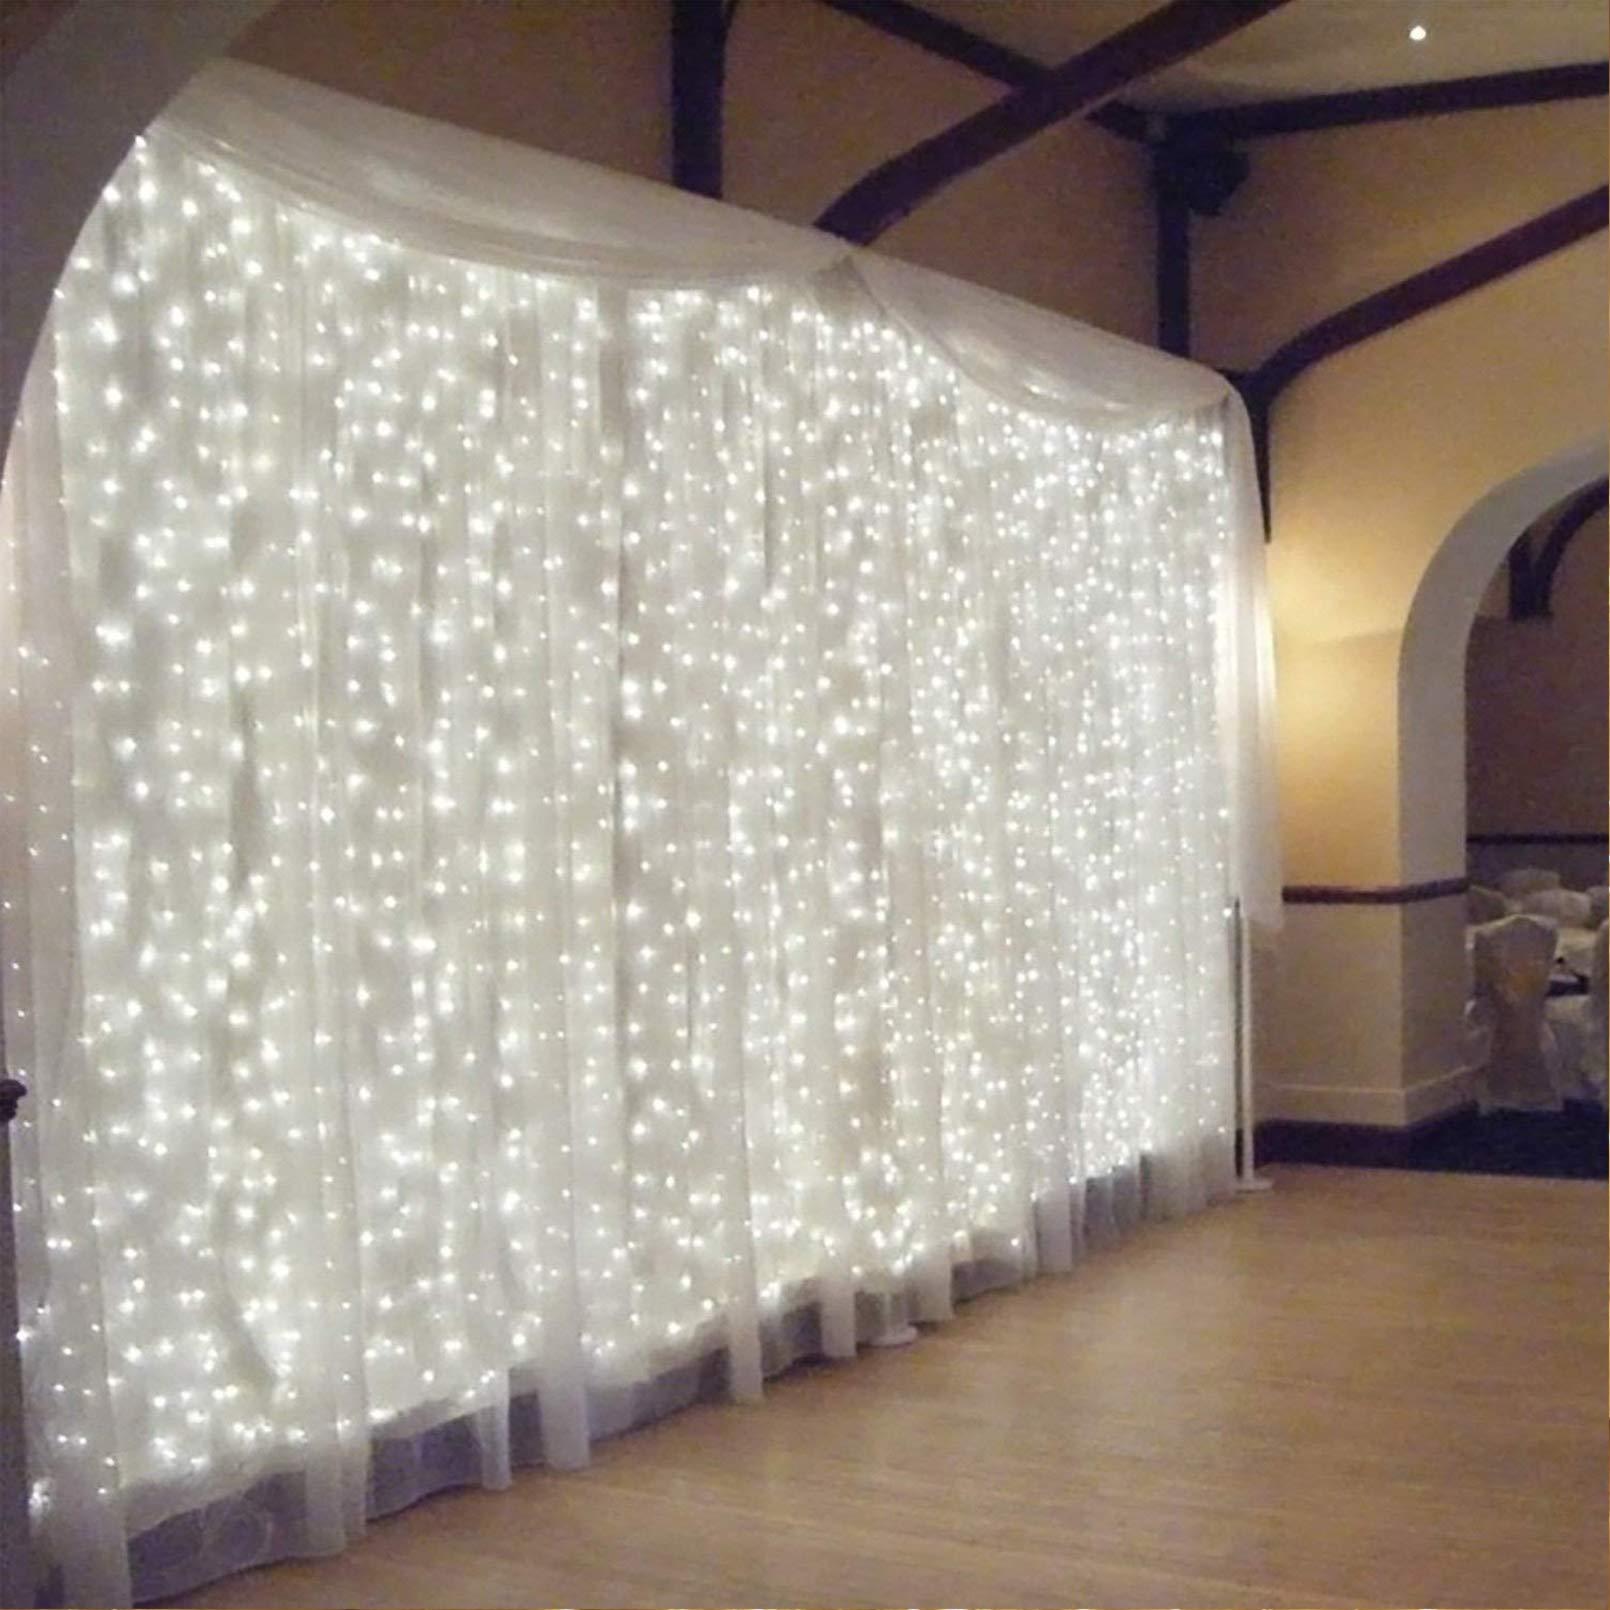 TORCHSTAR 9.8FT × 9.8FT Window Curtain Light